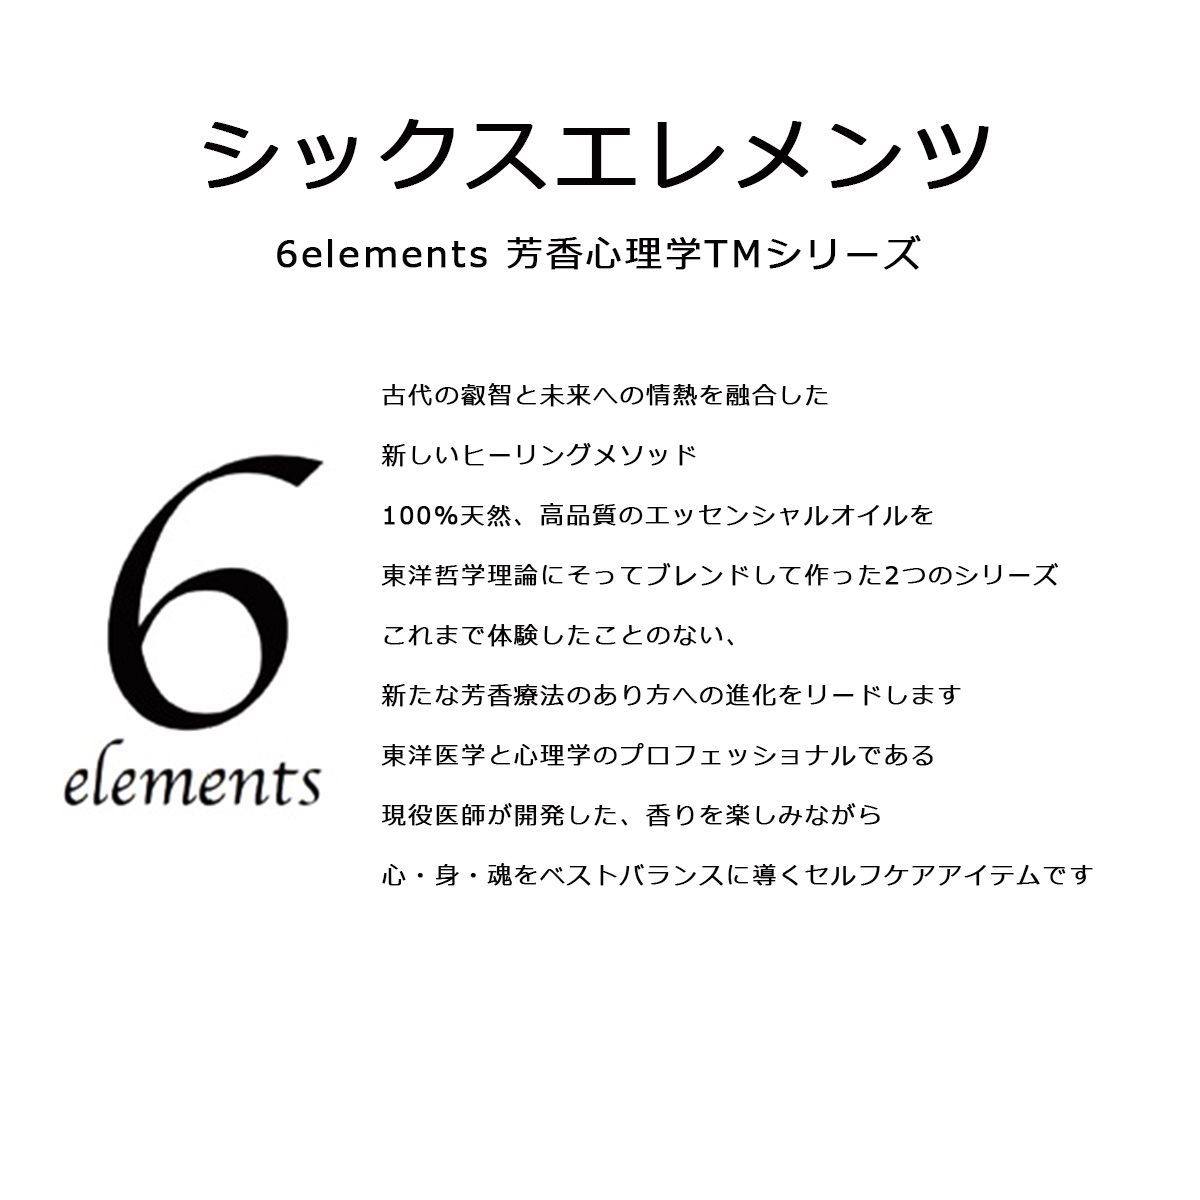 6elements Japan 六行ROKUGYO 空KUU 2mL 【 翌日配達 送料無料 】 【 アロマ アロマテラピー 天然成分 高品質 エッセンシャルオイル  】